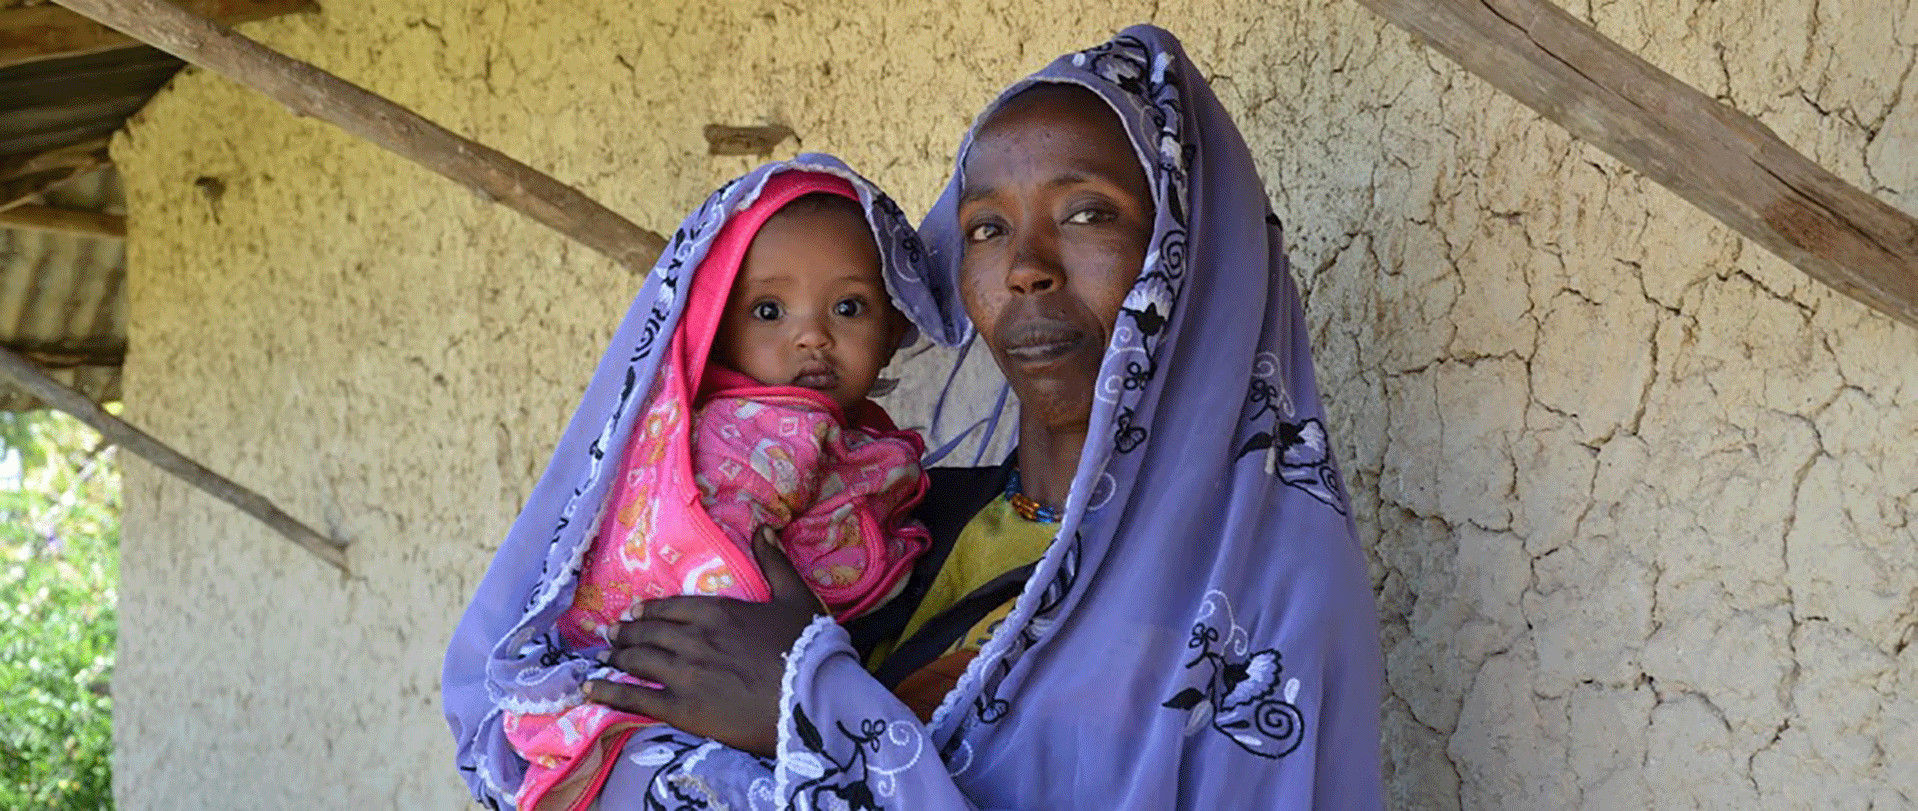 homepage-slider-el-nino-crisis-appeal-1920-razaiya-and-baby-ethiopia